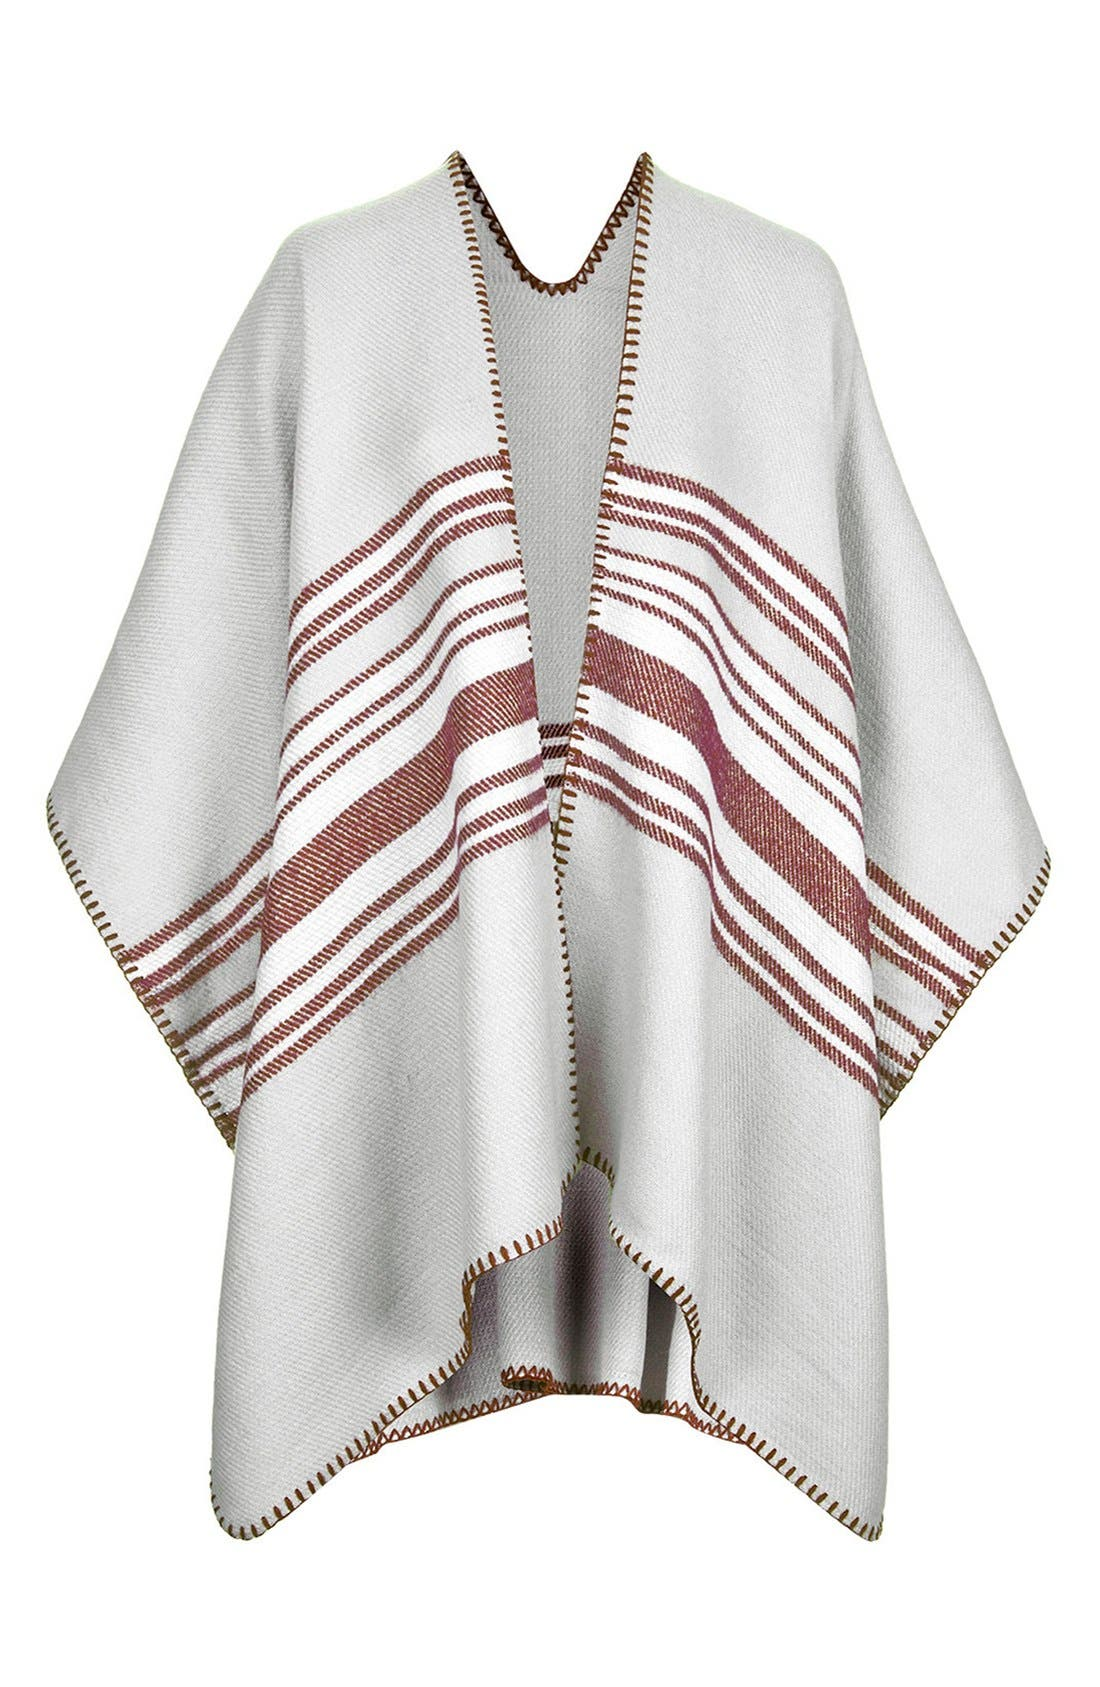 Alternate Image 1 Selected - Topshop Stripe Blanket Cape